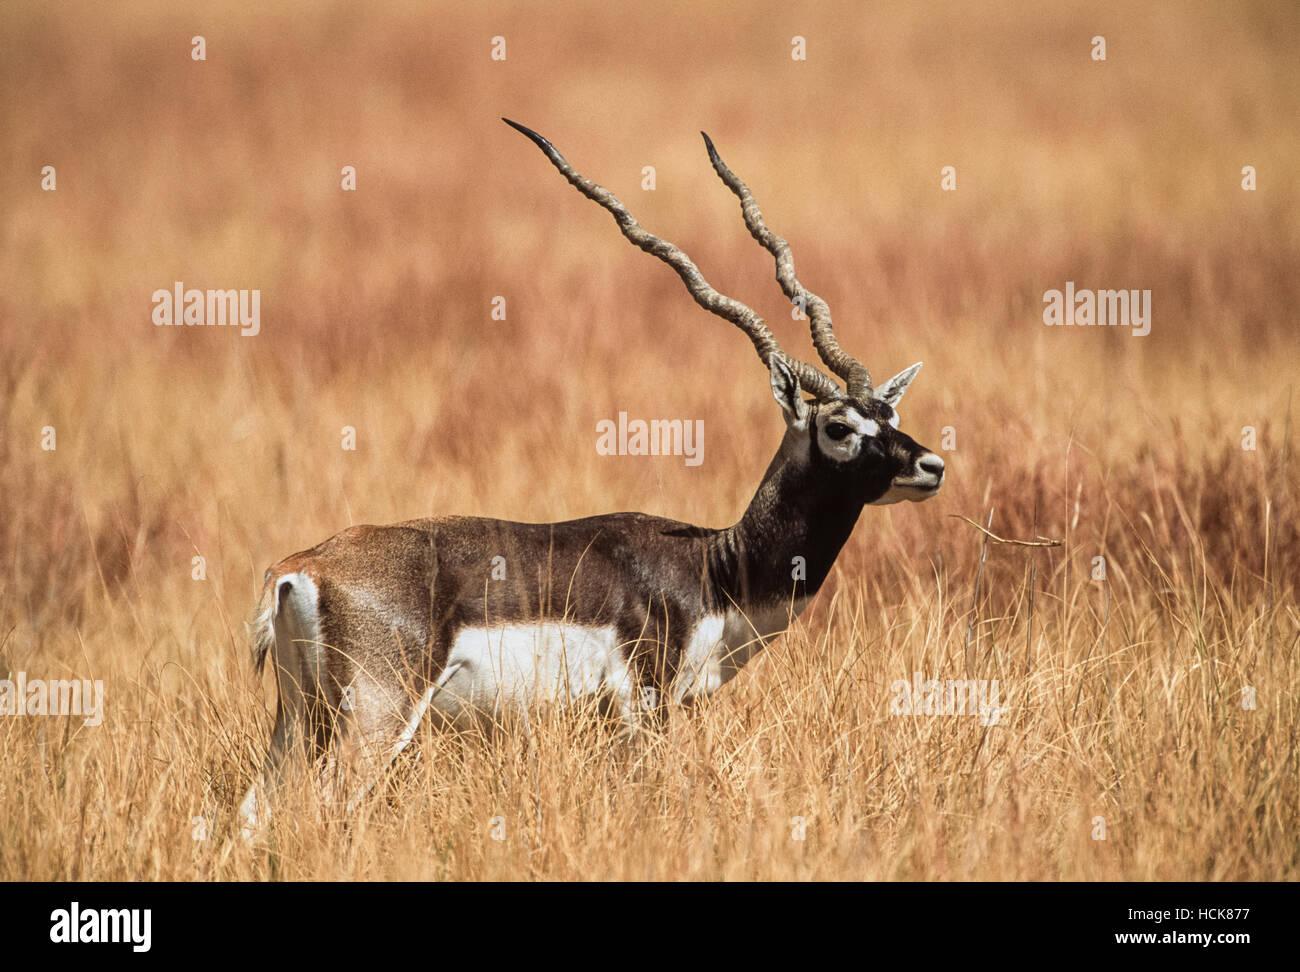 Indian Blackbuck, (Antilope cervicapra), adult male on grassland plains, Blackbuck National Park,Velavadar,Gujarat,India Stock Photo